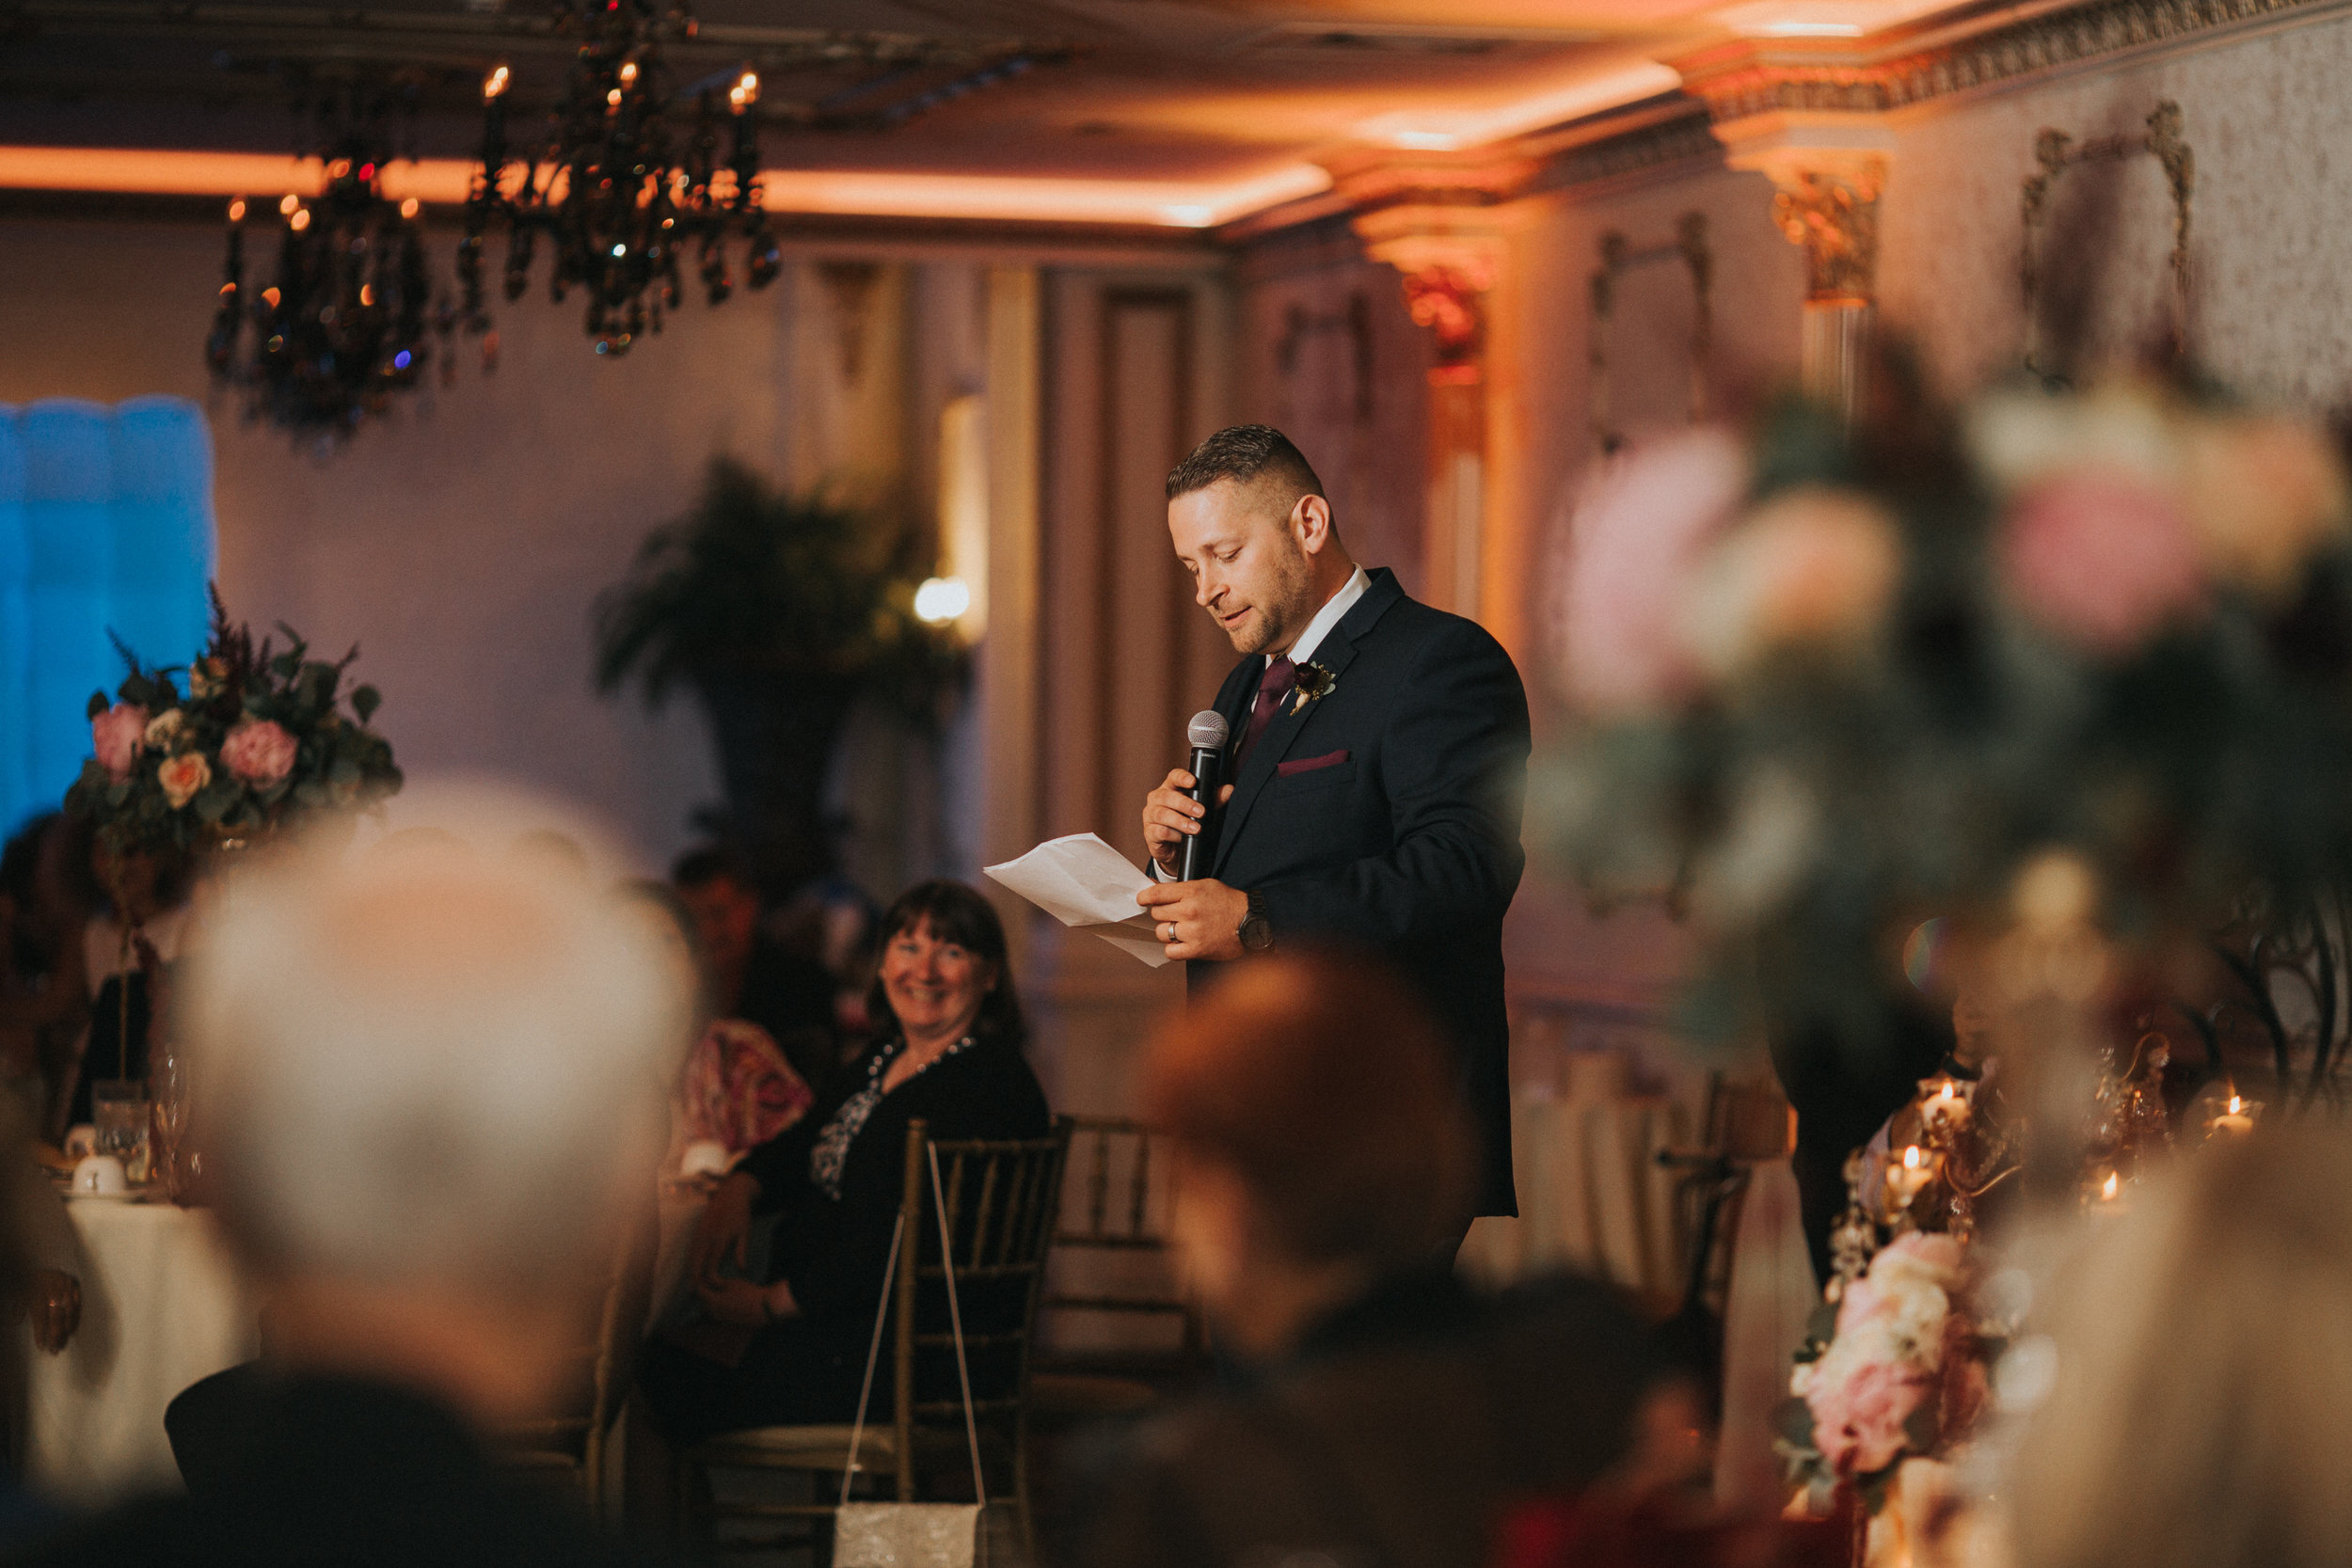 New-Jersey-Wedding-Photography-Brigalias-Deanna&Darryl-Reception-94.jpg